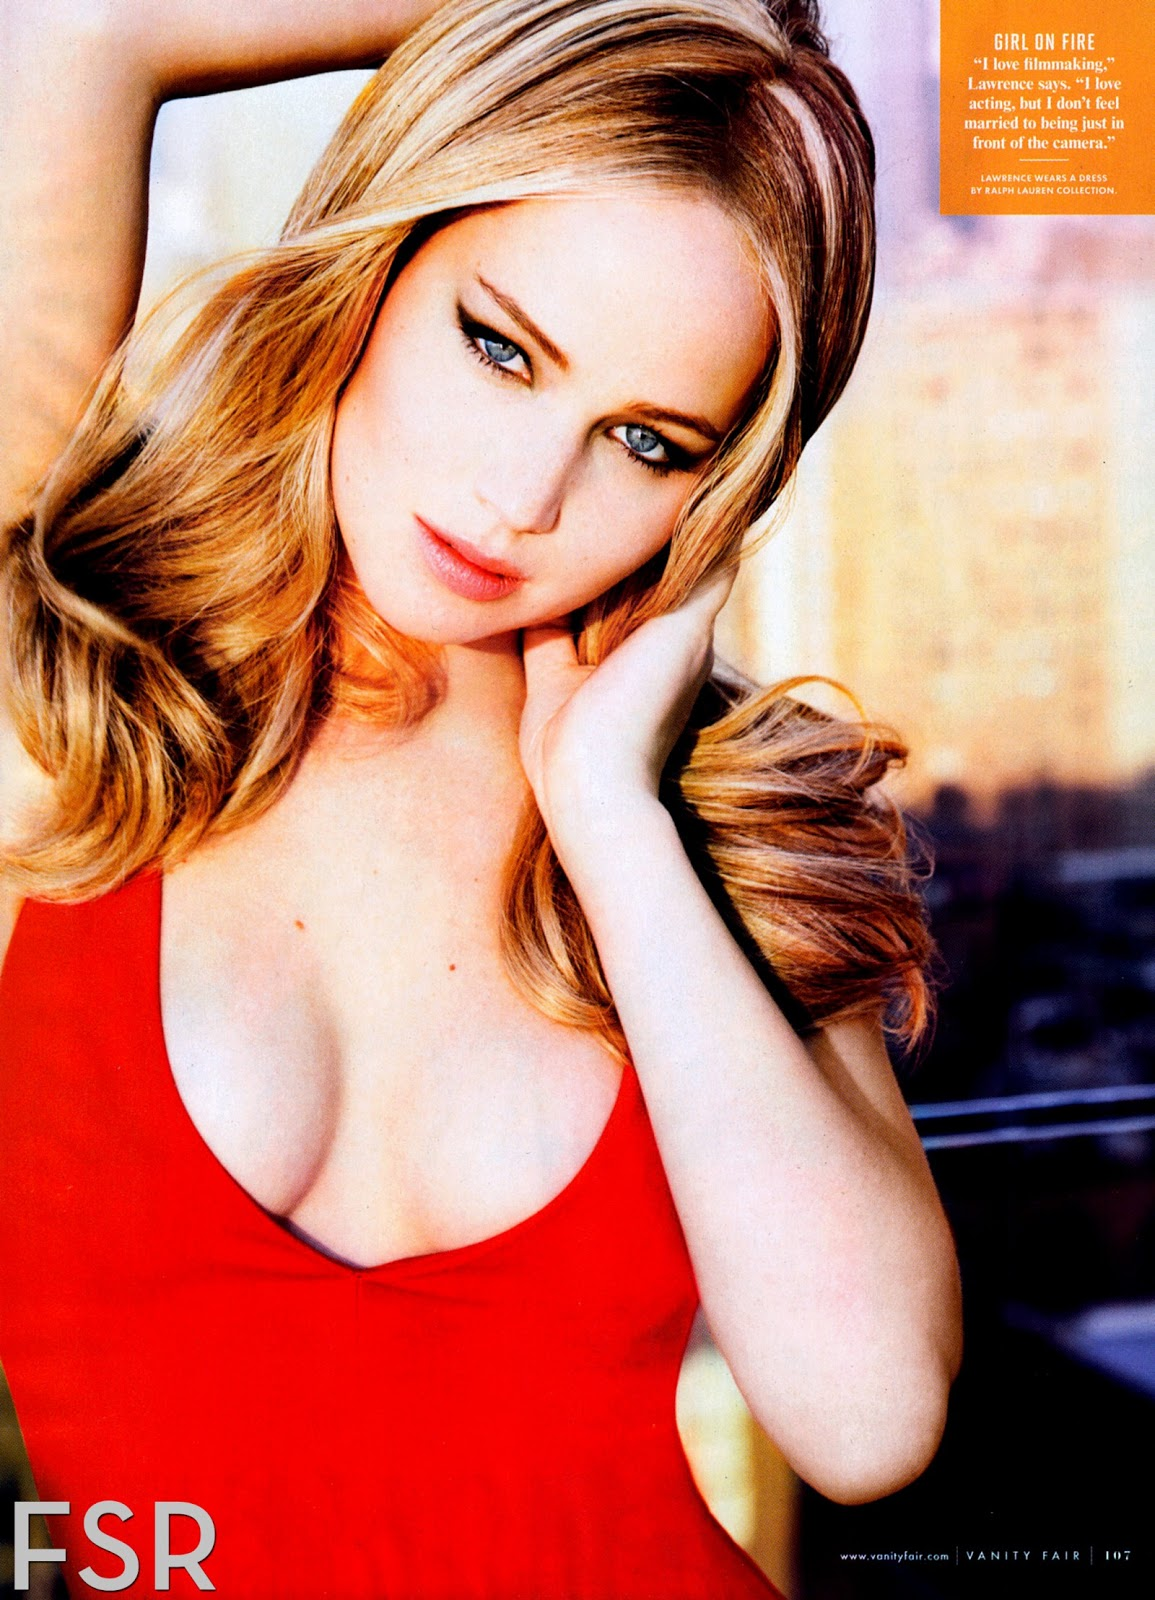 http://3.bp.blogspot.com/-kAD6vo-tqxc/UOQG76khiUI/AAAAAAABmlY/uhuoBwSVoTU/s1600/Jennifer-Lawrence-5.jpg